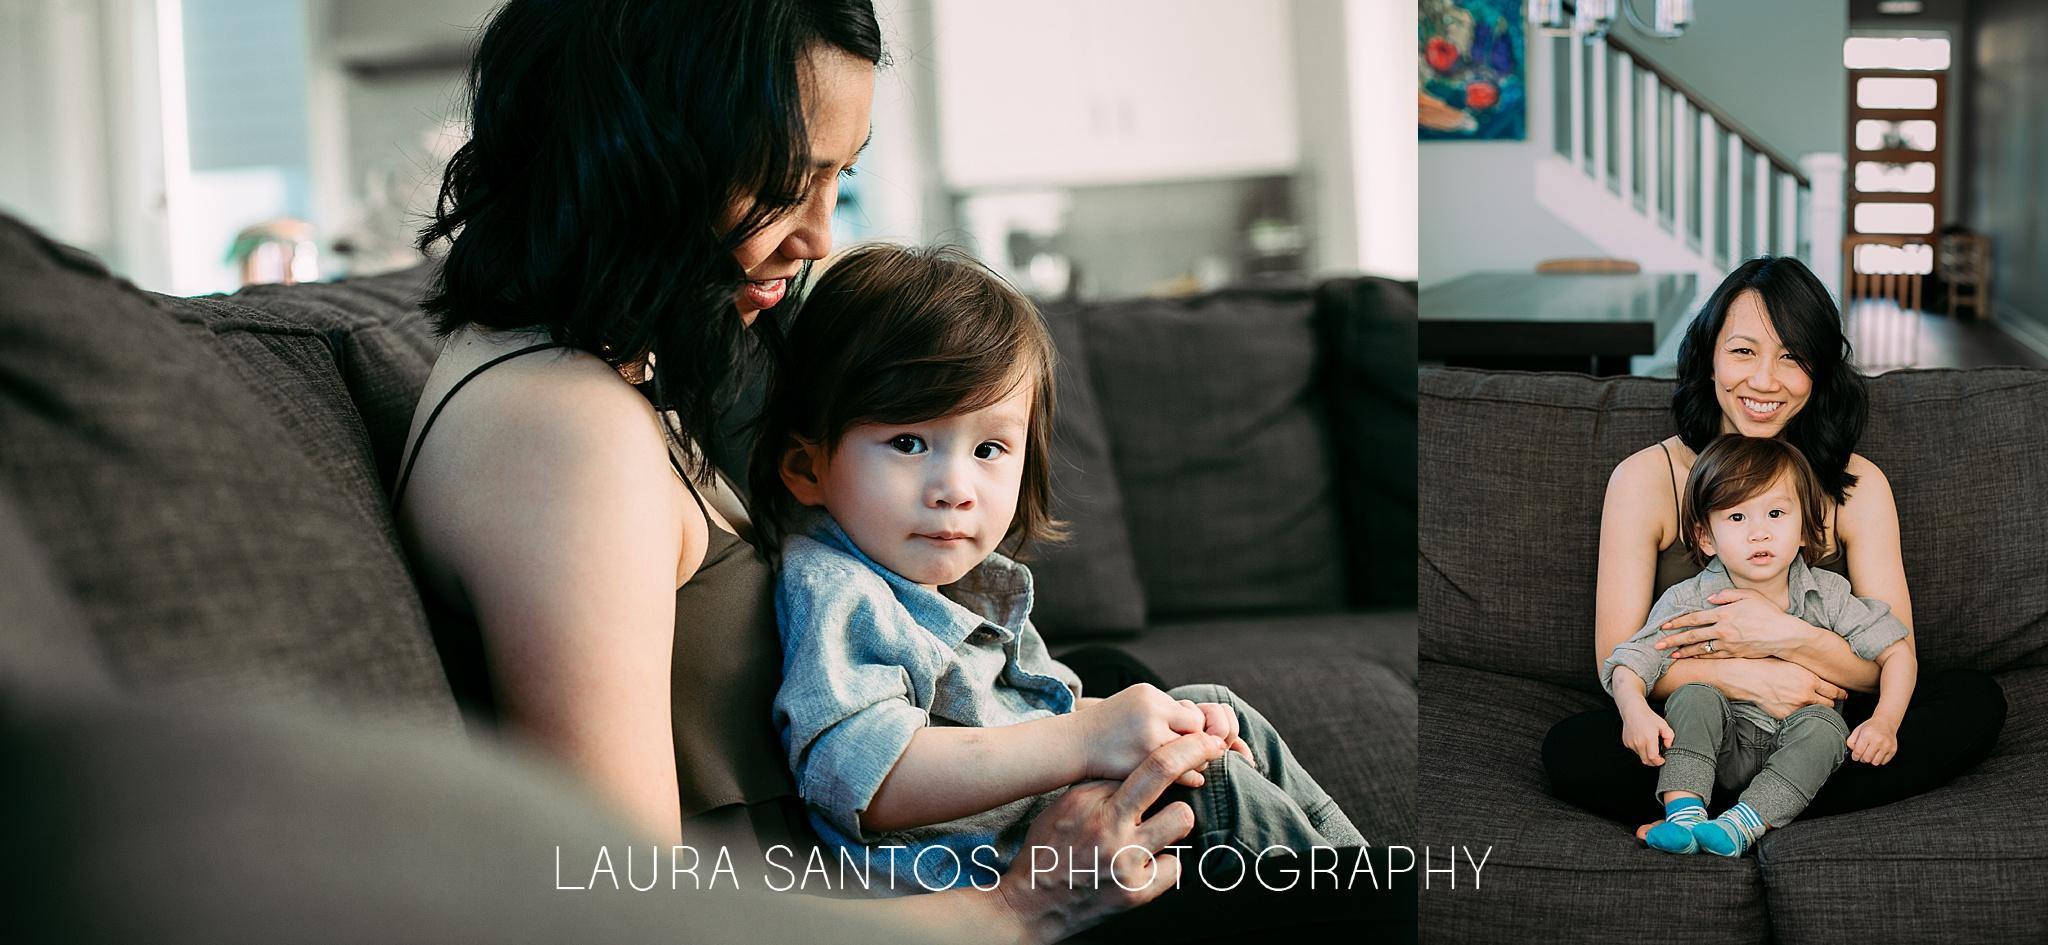 Laura Santos Photography Portland Oregon Family Photographer_0591.jpg